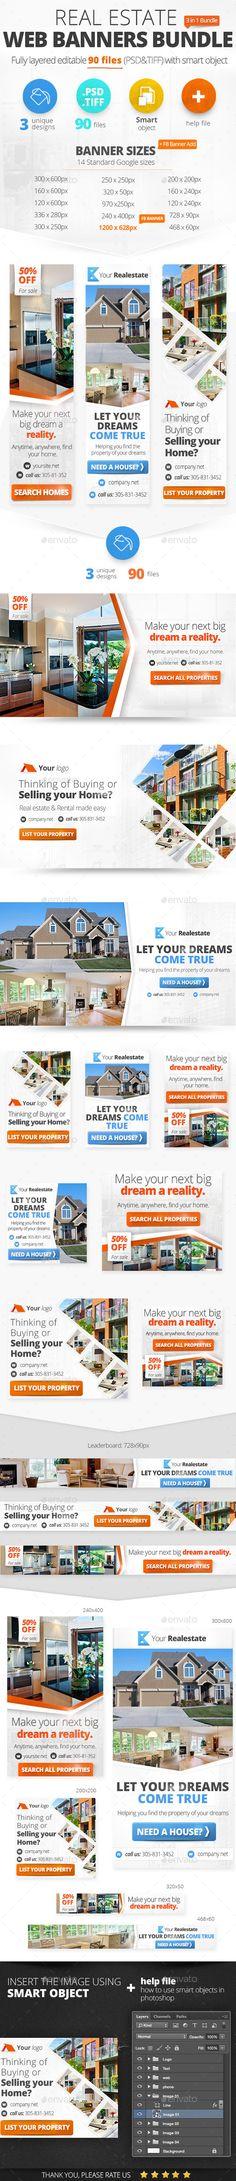 Real Estate Web Banners Bundle Template #design #ads #web Download: http://graphicriver.net/item/real-estate-web-banners-bundle/12506855?ref=ksioks